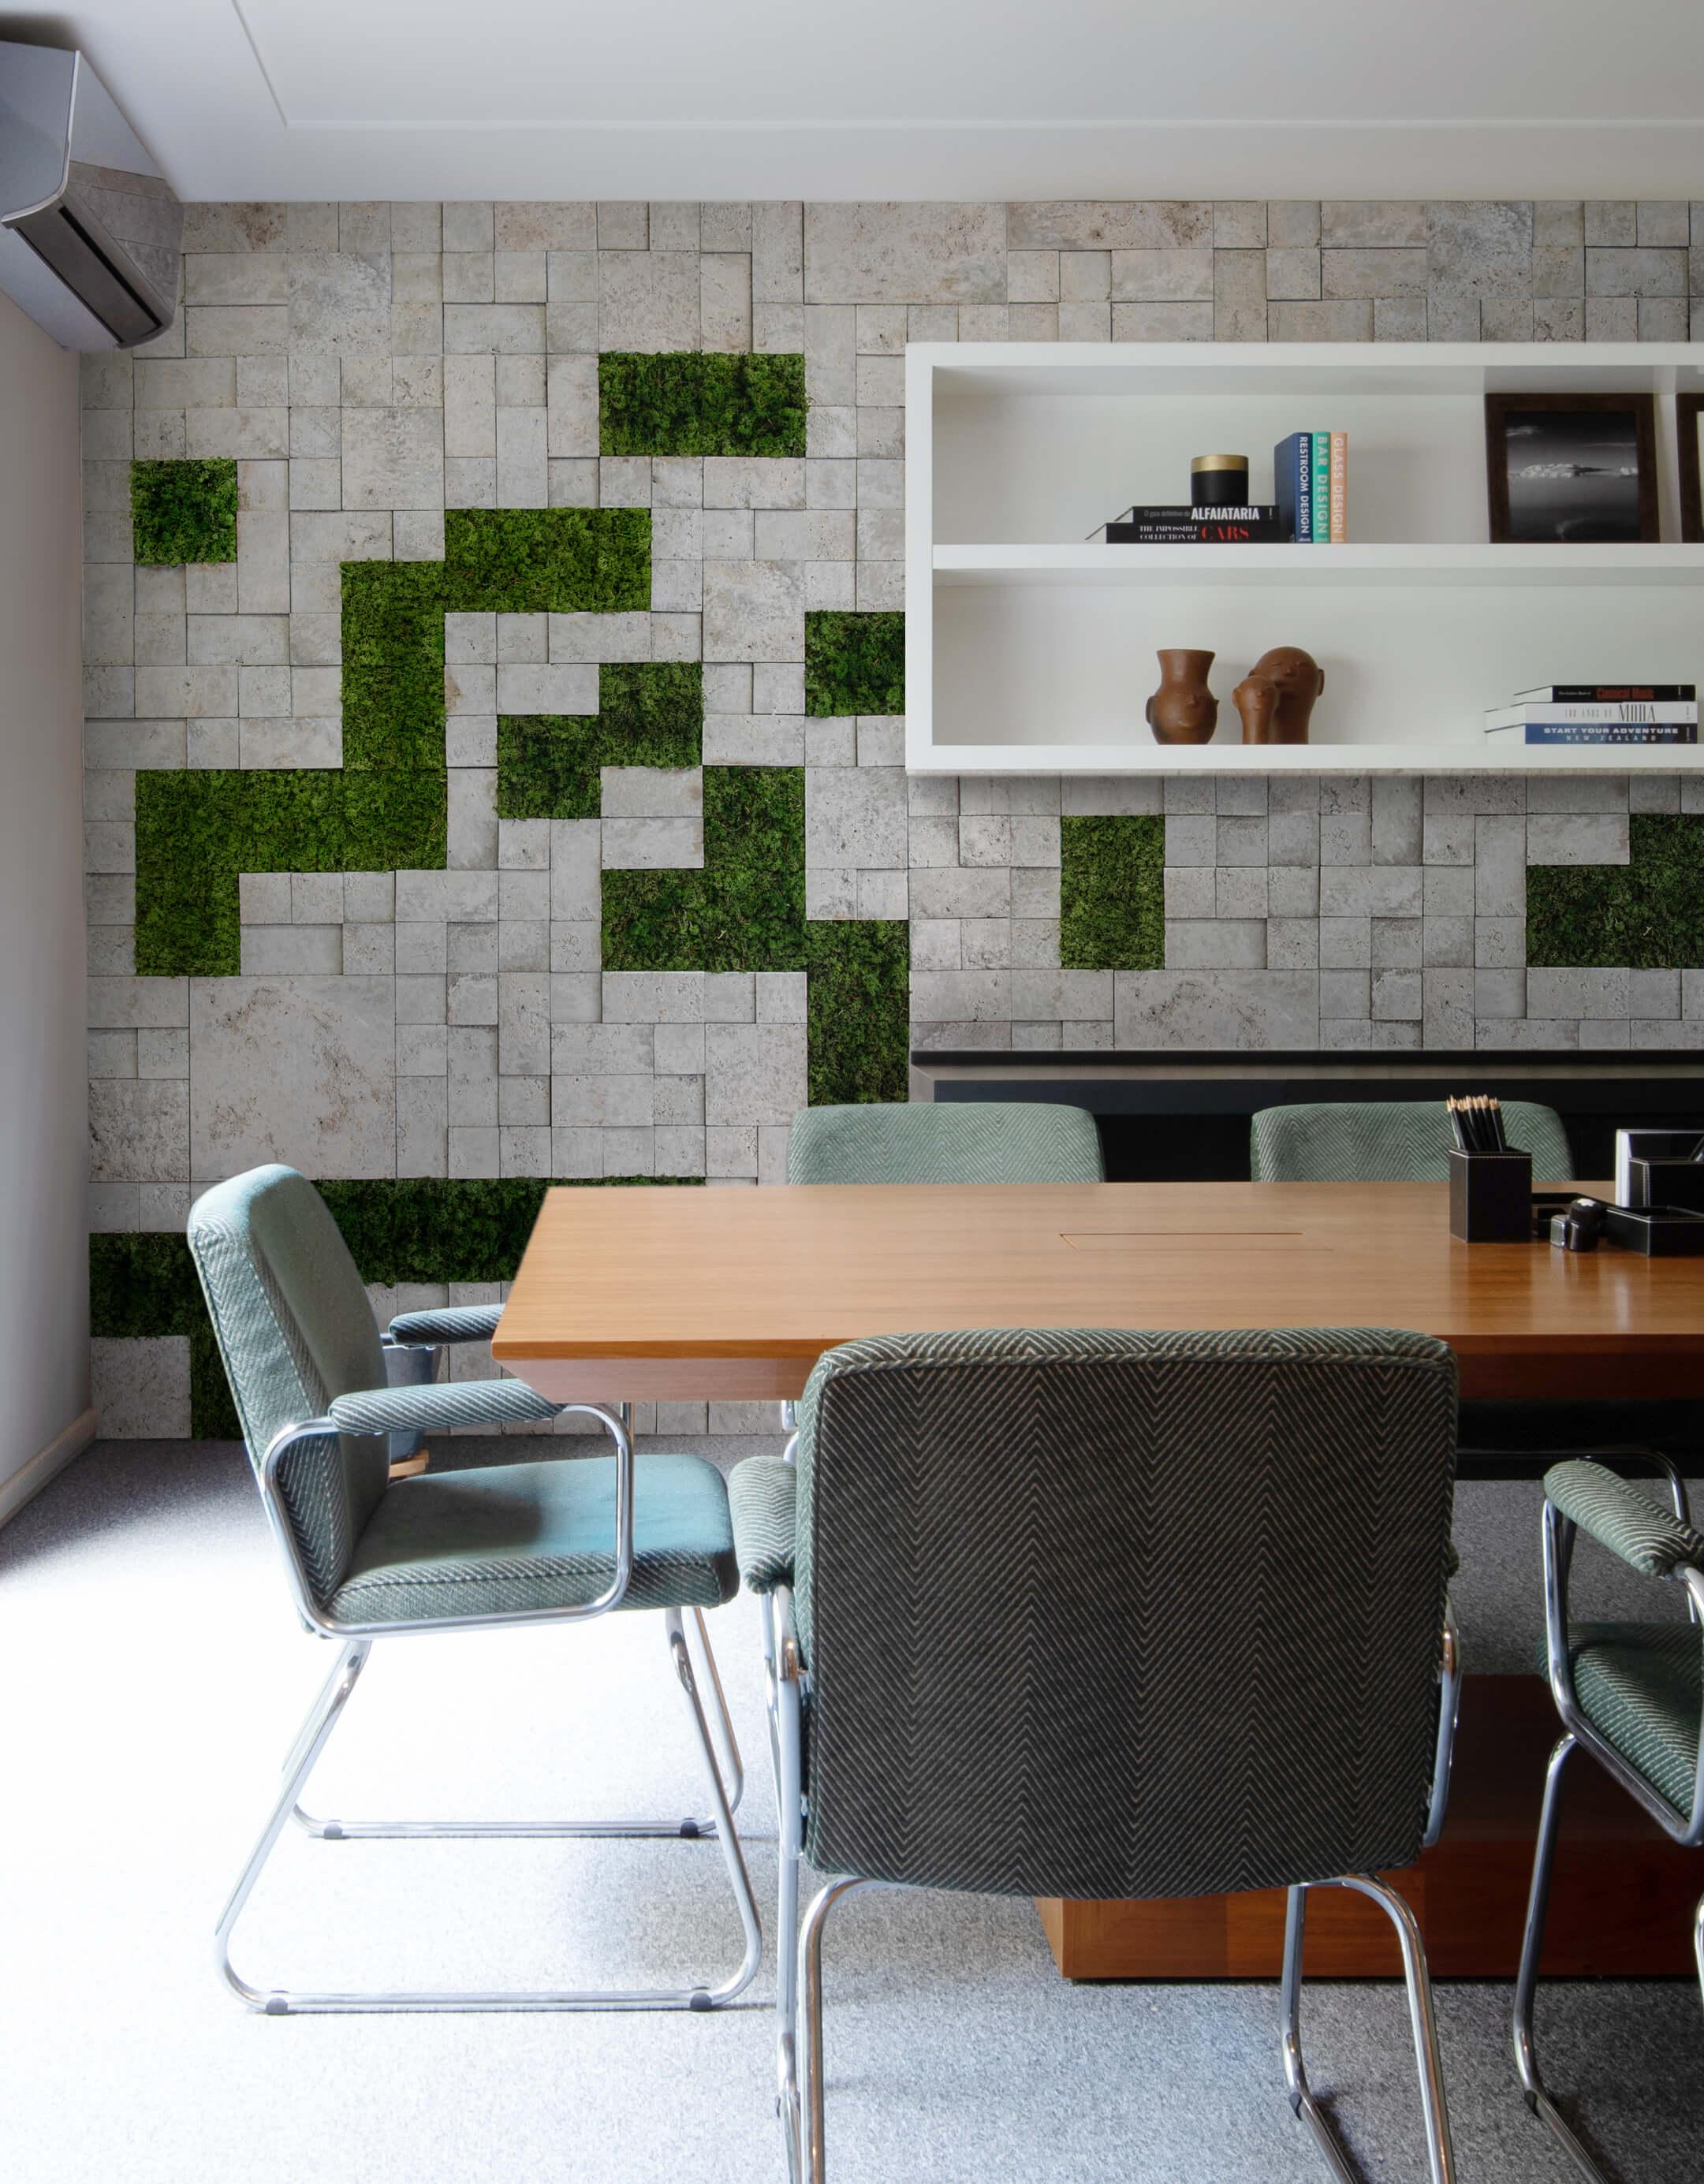 Mosaico Etrusco Fendi - Moss verde floresta - Arq. Thalita Aguilar - Foto Favaro Jr.